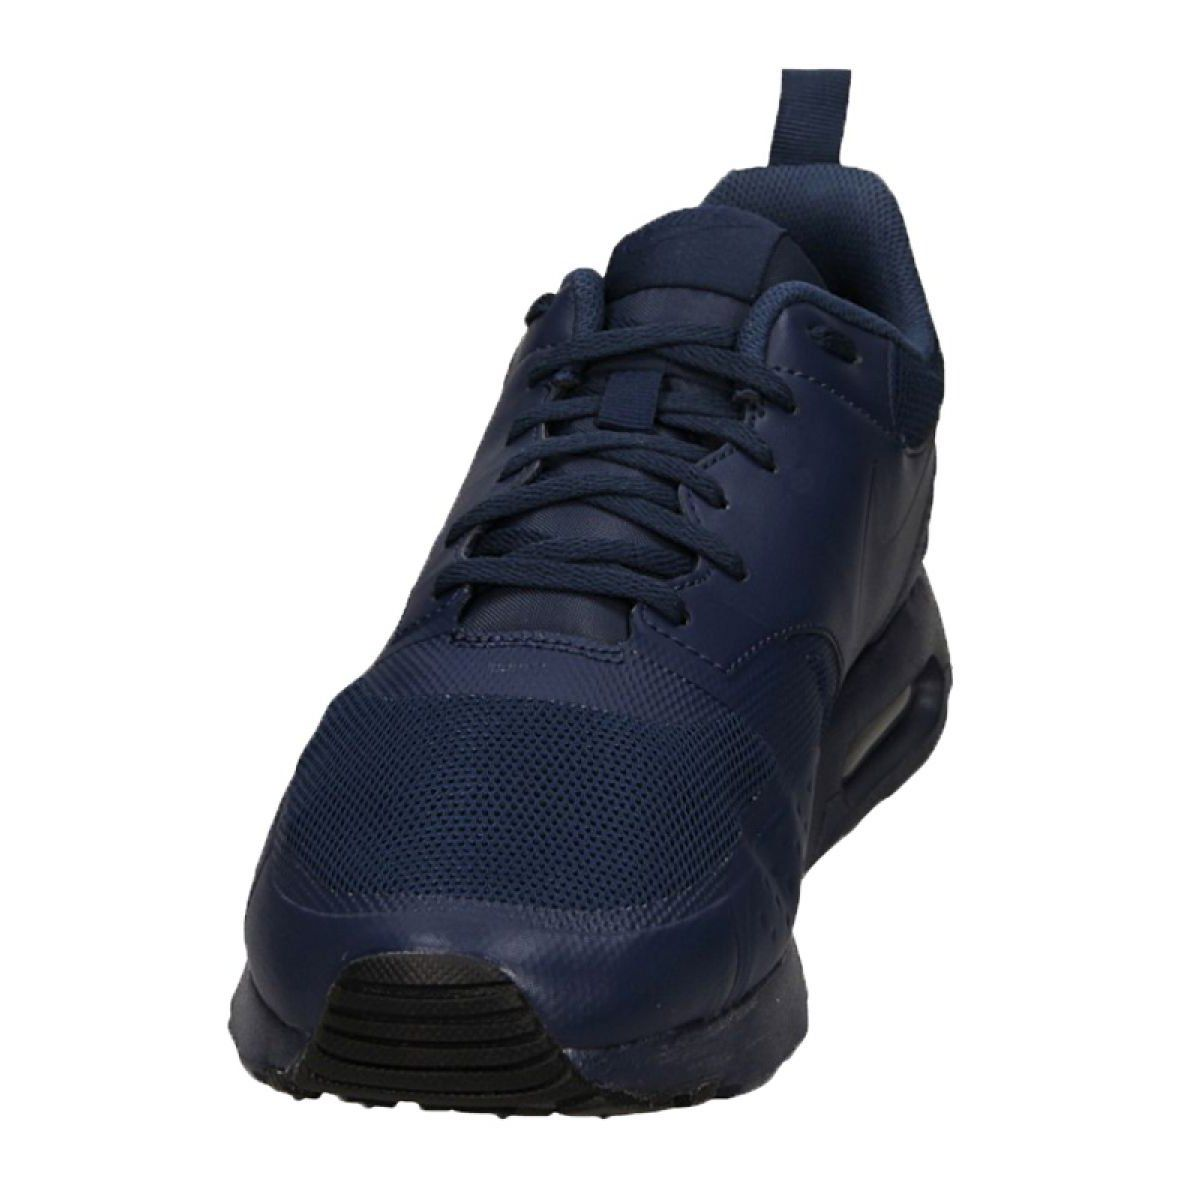 Buty Nike Air Max Vision M 918230 401 Granatowe Nike Air Mens Nike Shoes Nike Air Max